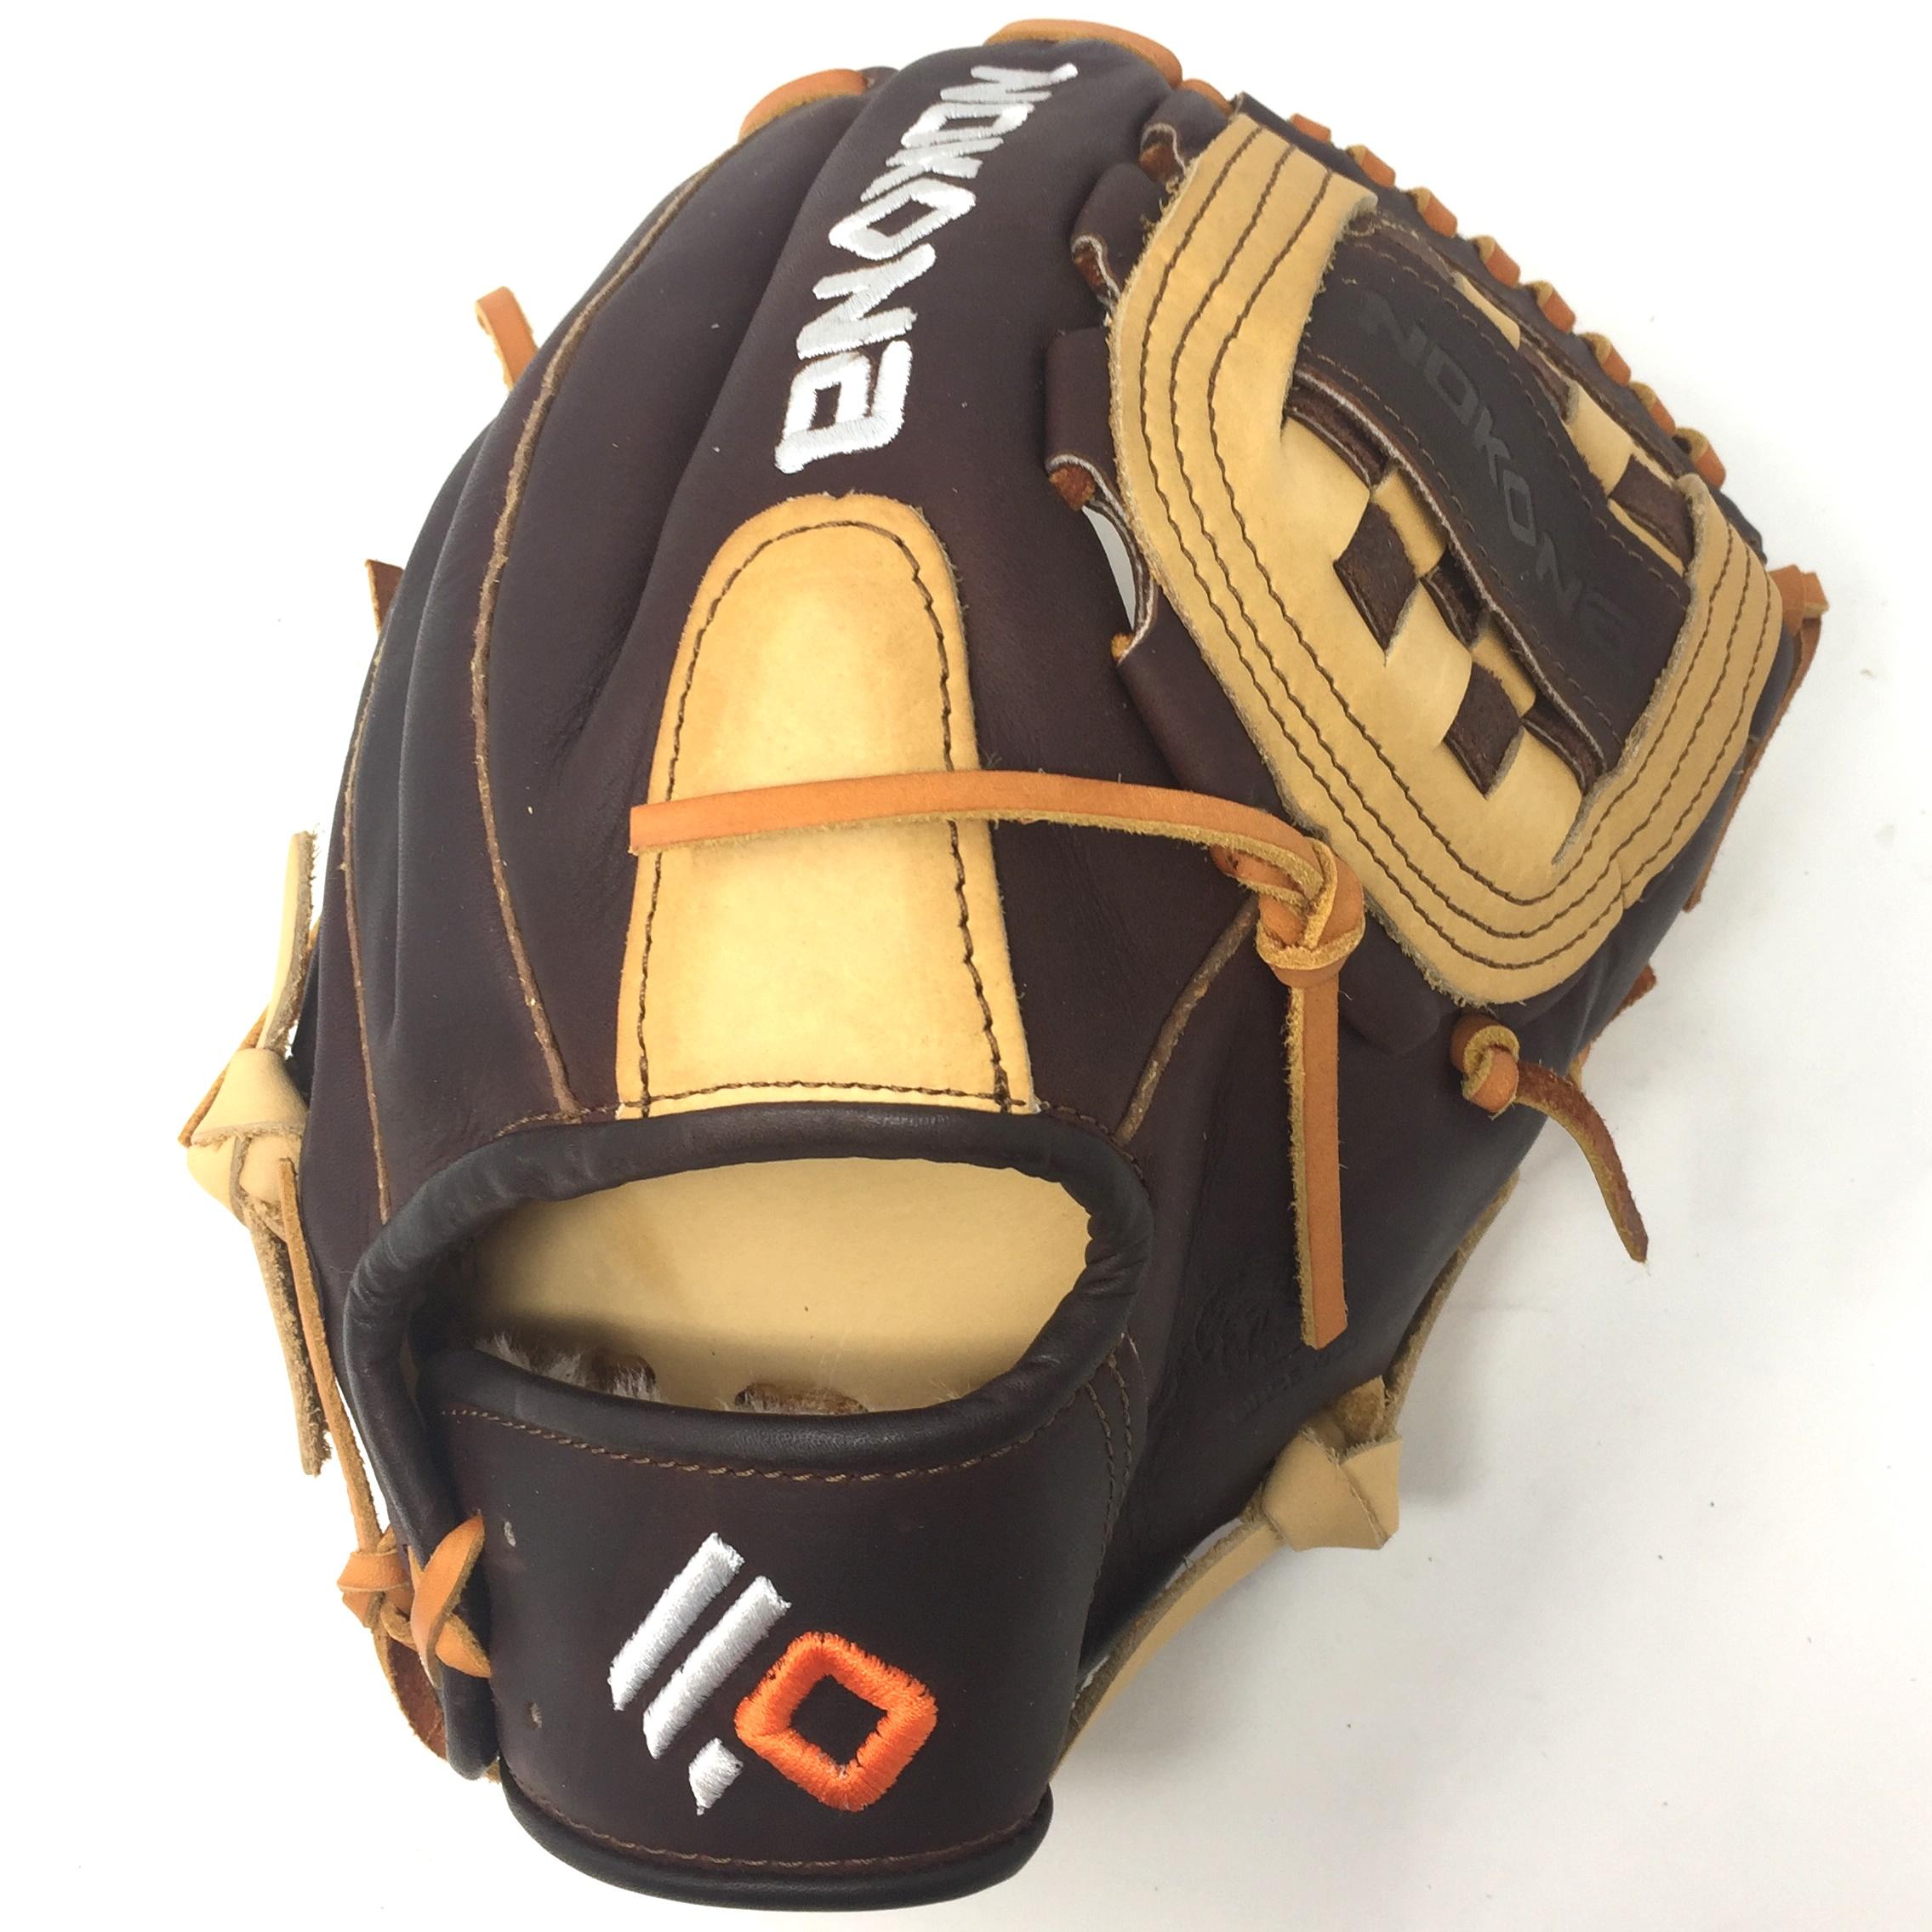 nokona-2020-alpha-12-inch-baseball-glove-s-1200c-right-hand-throw S-1200C-20-RightHandThrow Nokona 808808893905 <p>12.00 Inch Pattern Constructed With American Buffalo & Top Grain Stampede